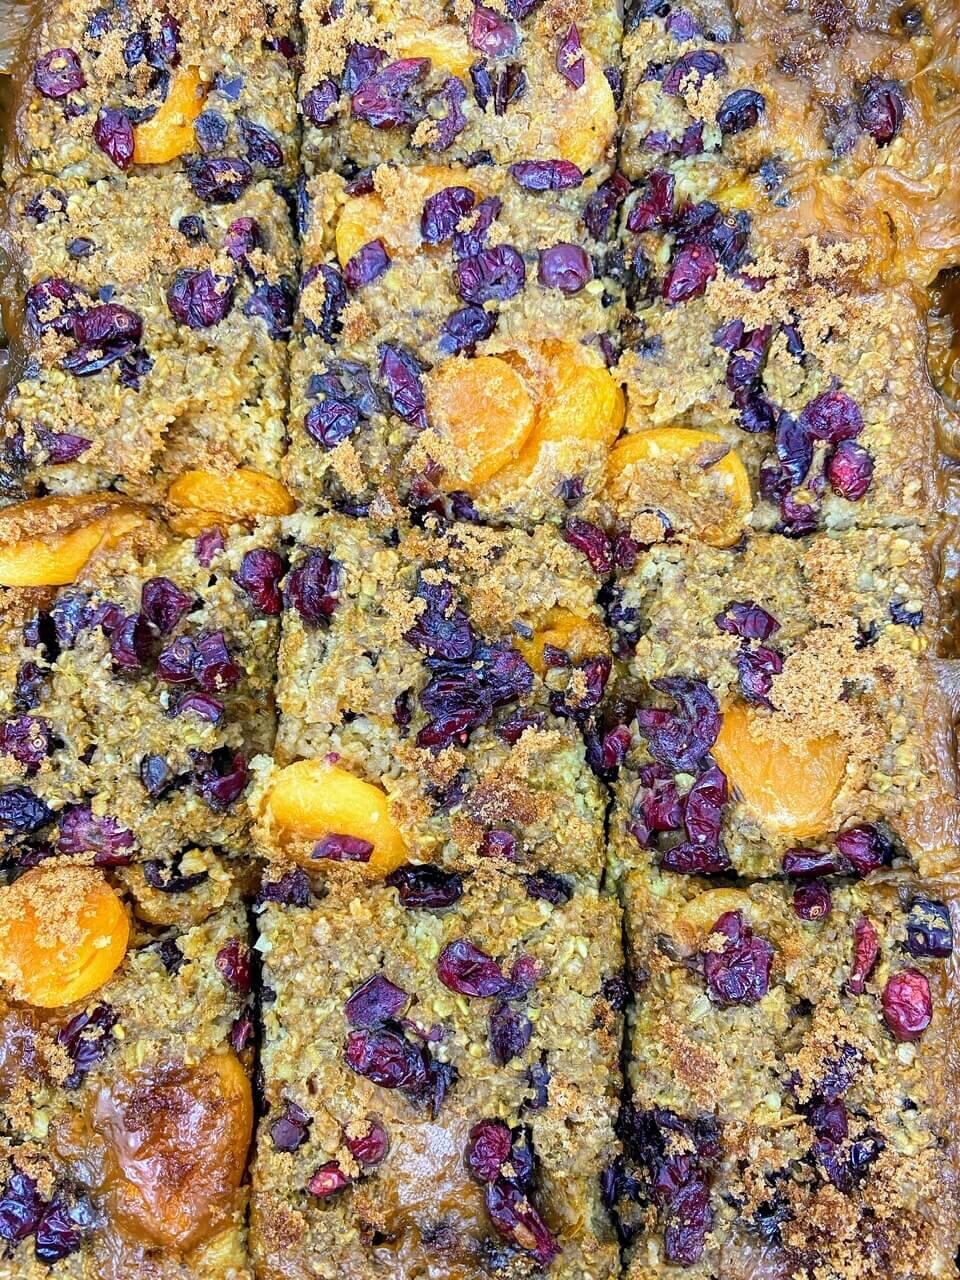 Dried Fruit and Oatmeal Bake